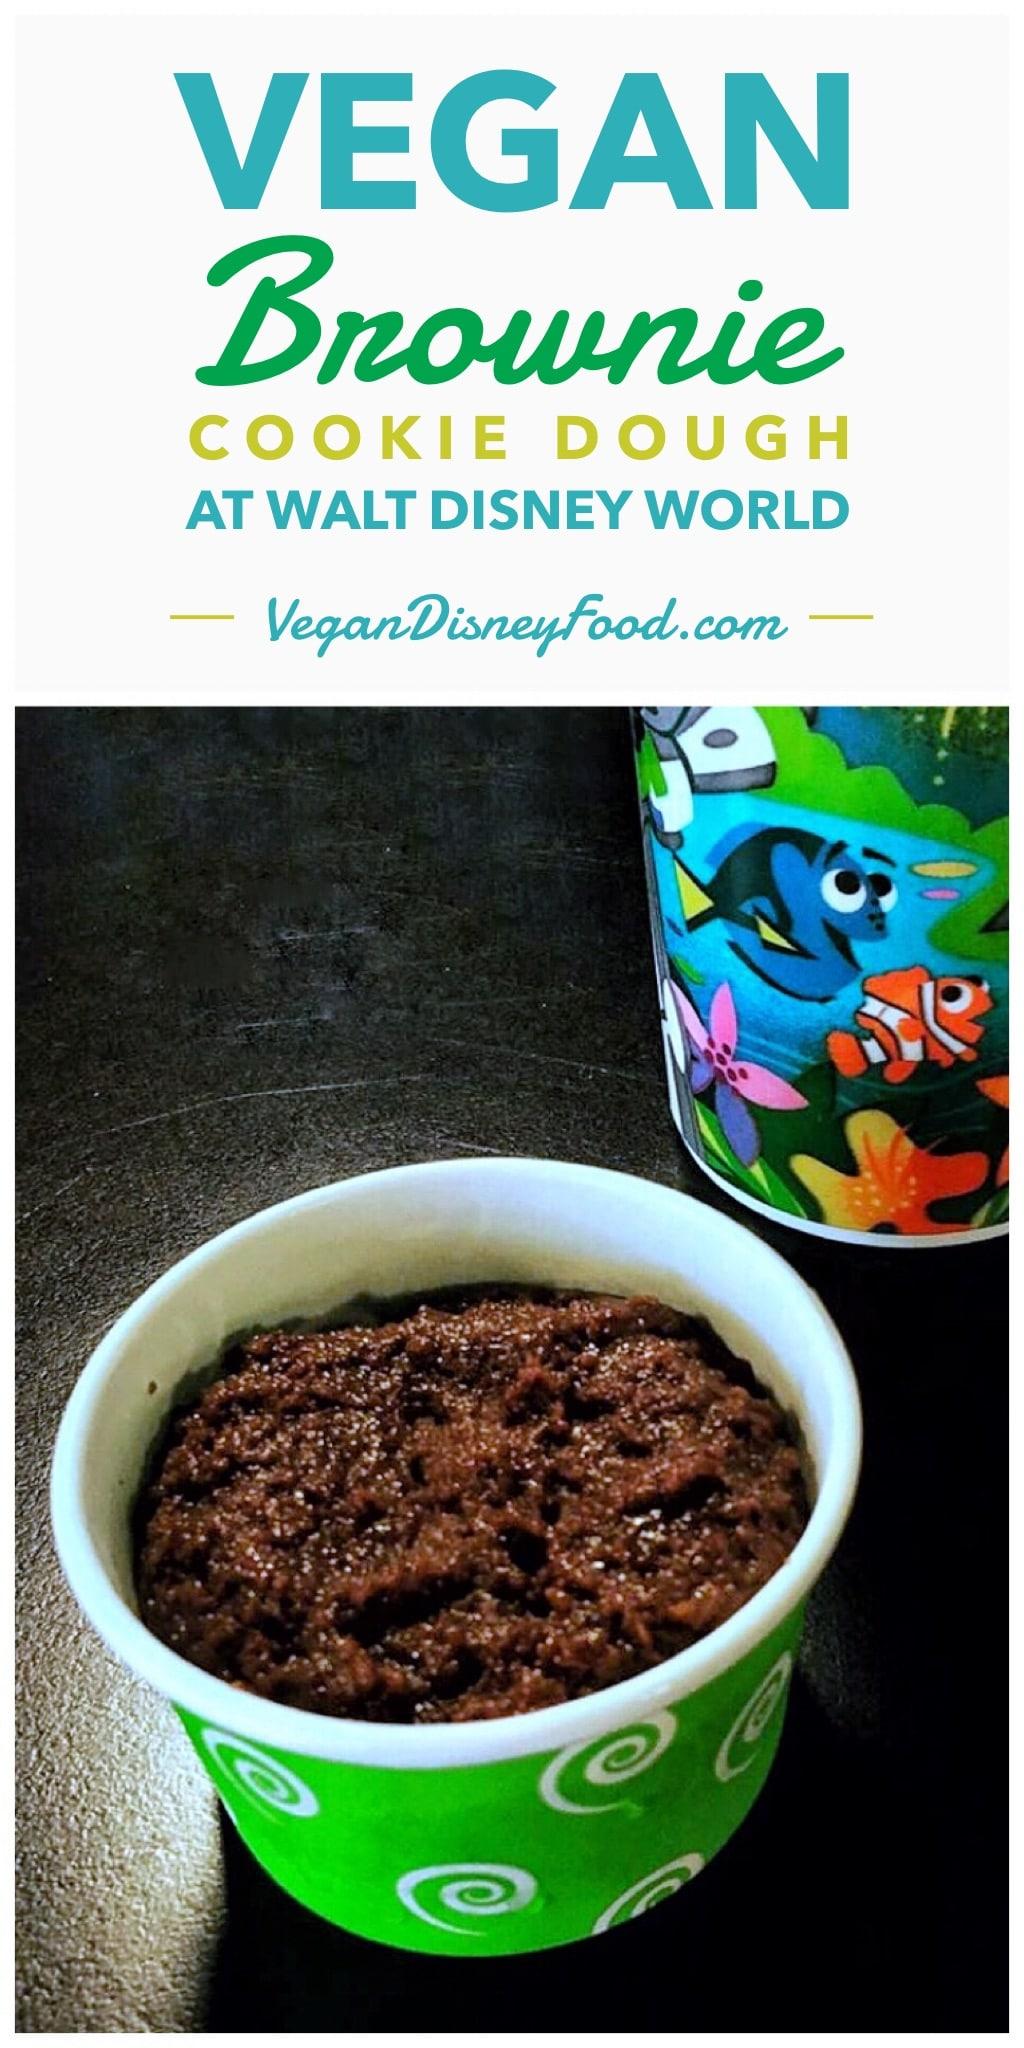 Vegan Brownie Cookie Dough at All Star Sports in Walt Disney World